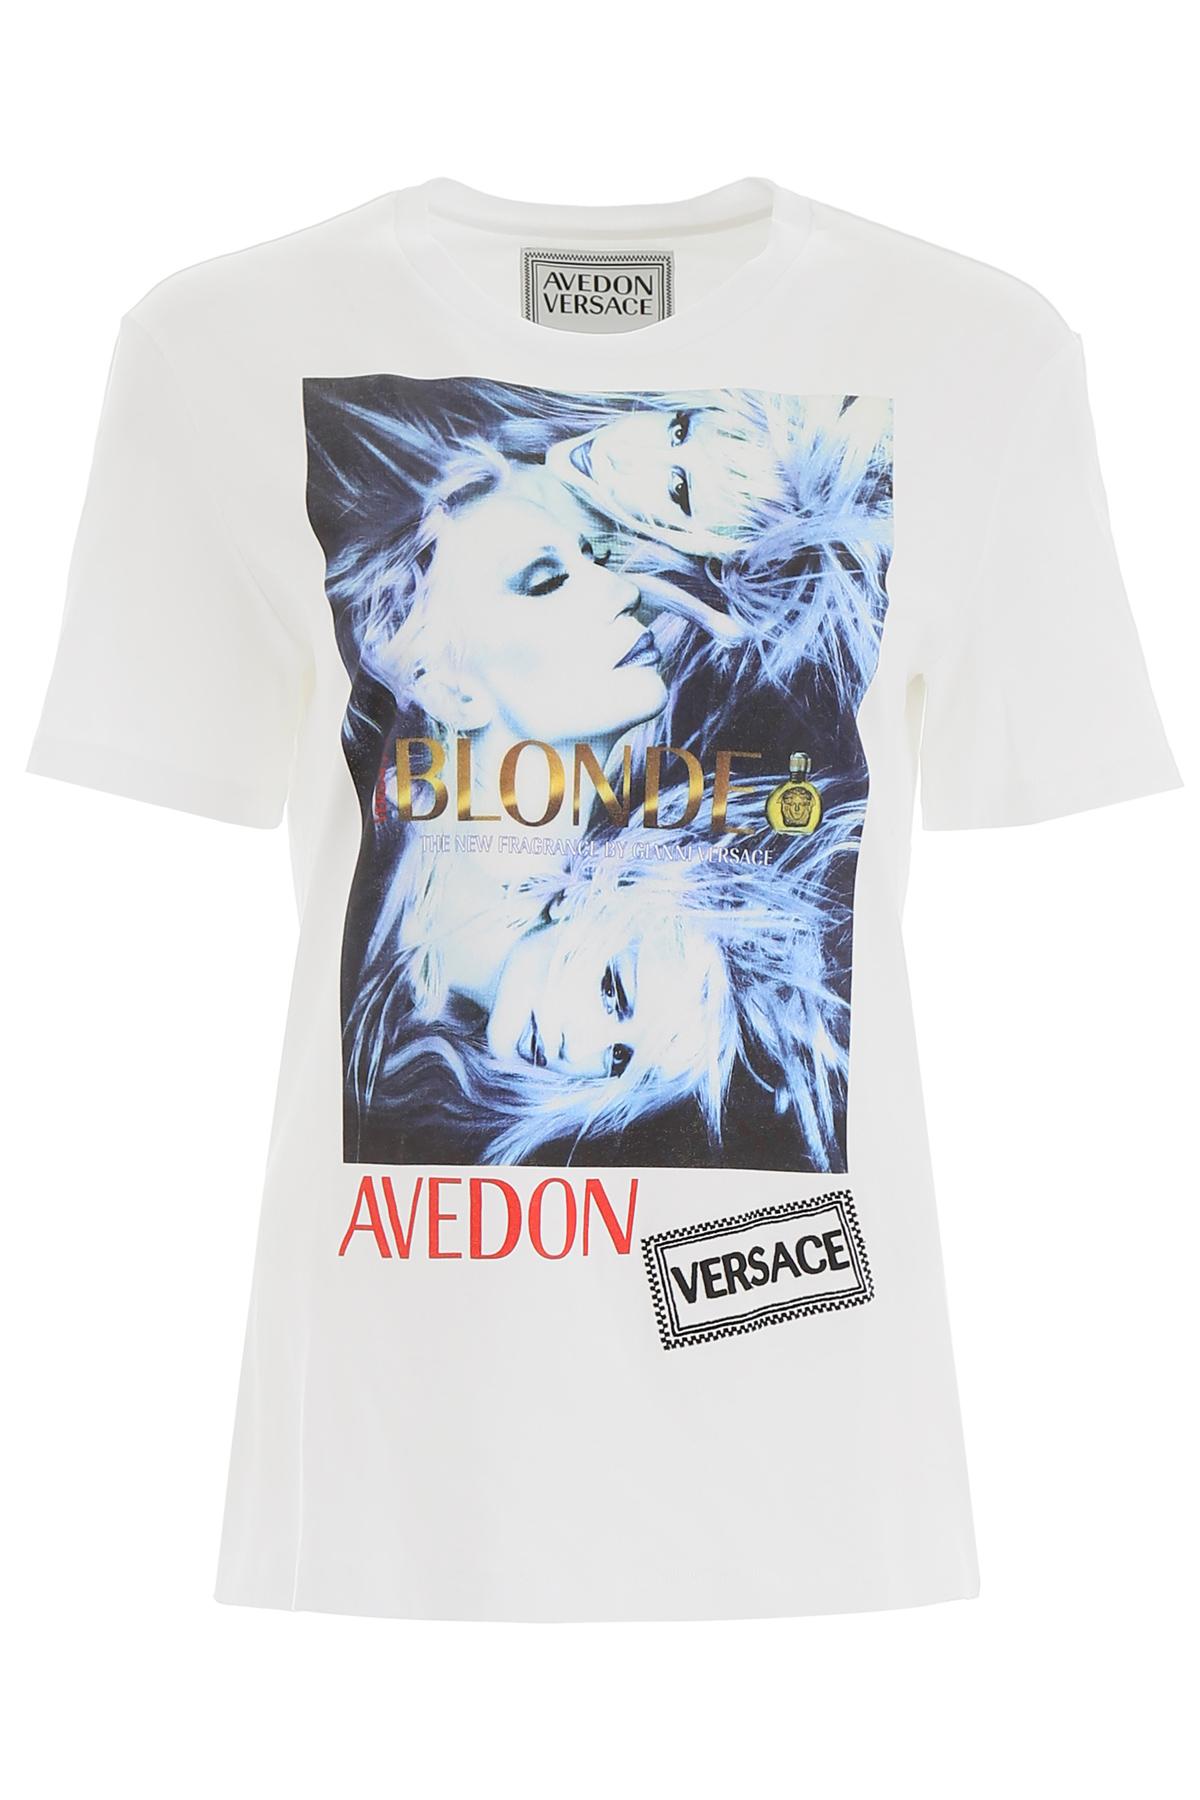 VERSACE AVEDON X VERSACE T-SHIRT M White Cotton